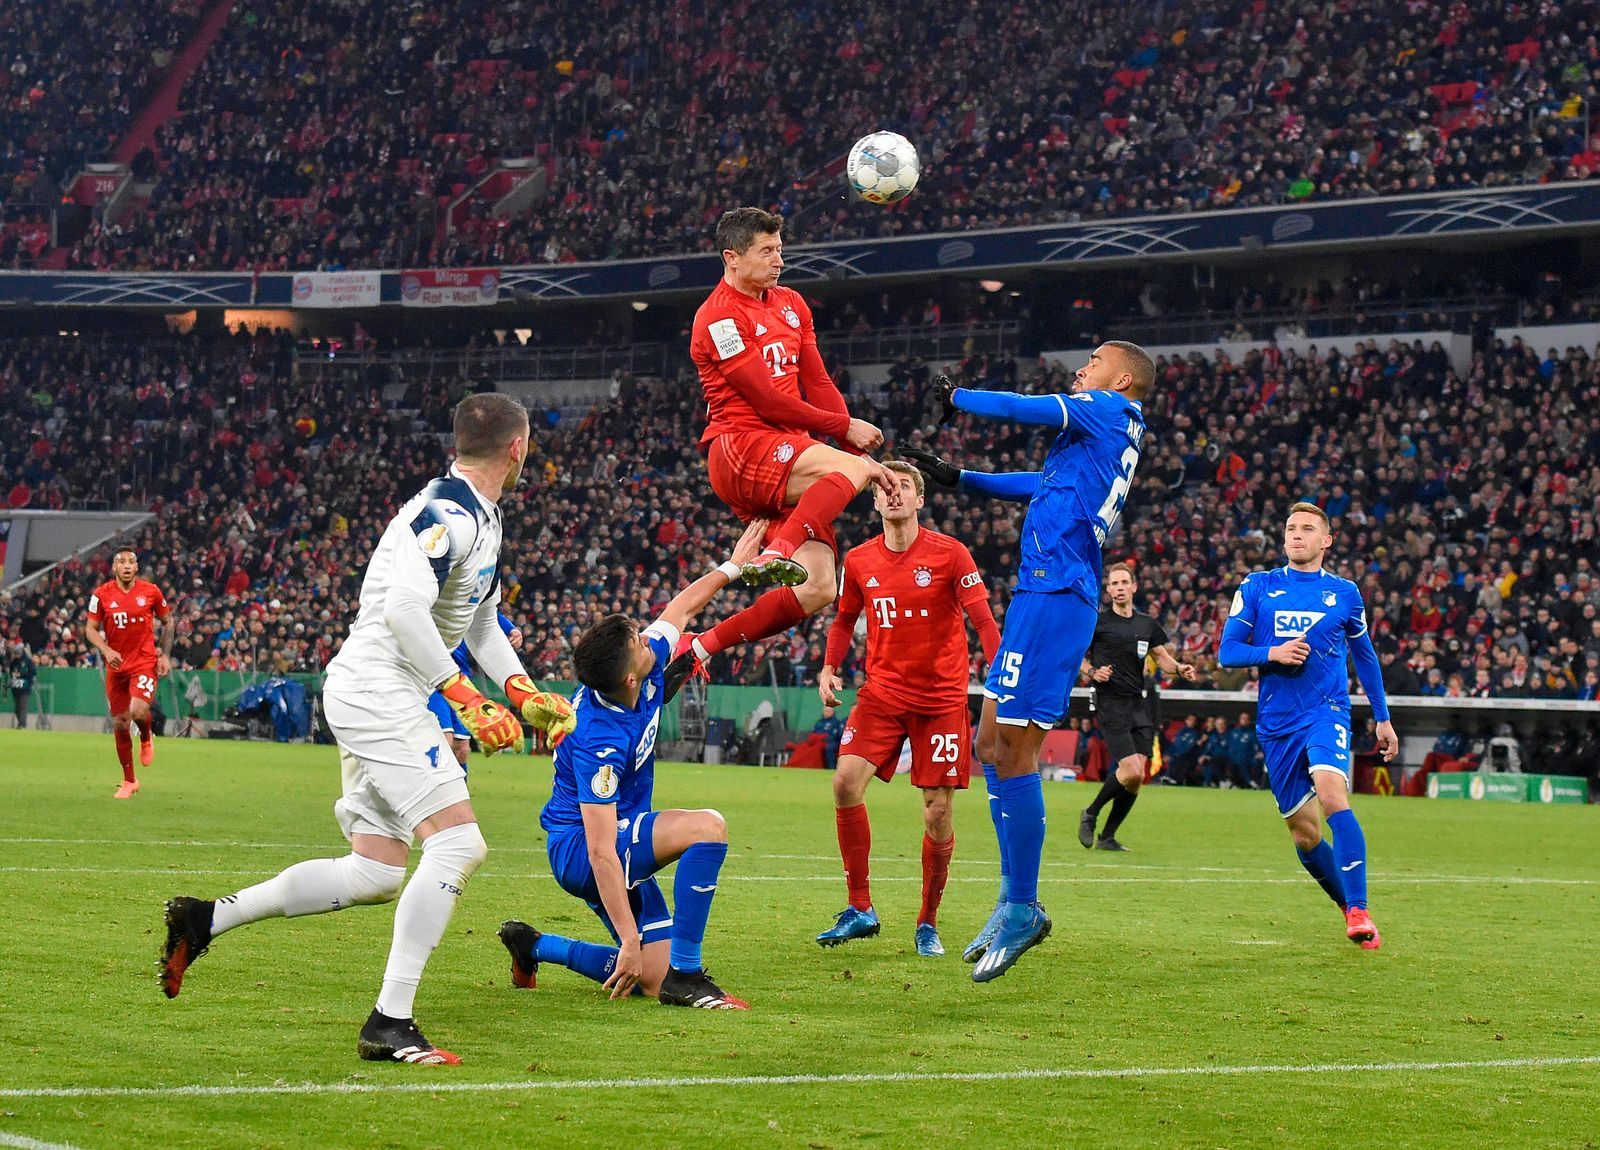 Sport Bilder des Tages 05.02.2020, Fussball DFB Pokal 2019/2020, Achtelfinale, FC Bayern München - TSG Hoffenheim, in de